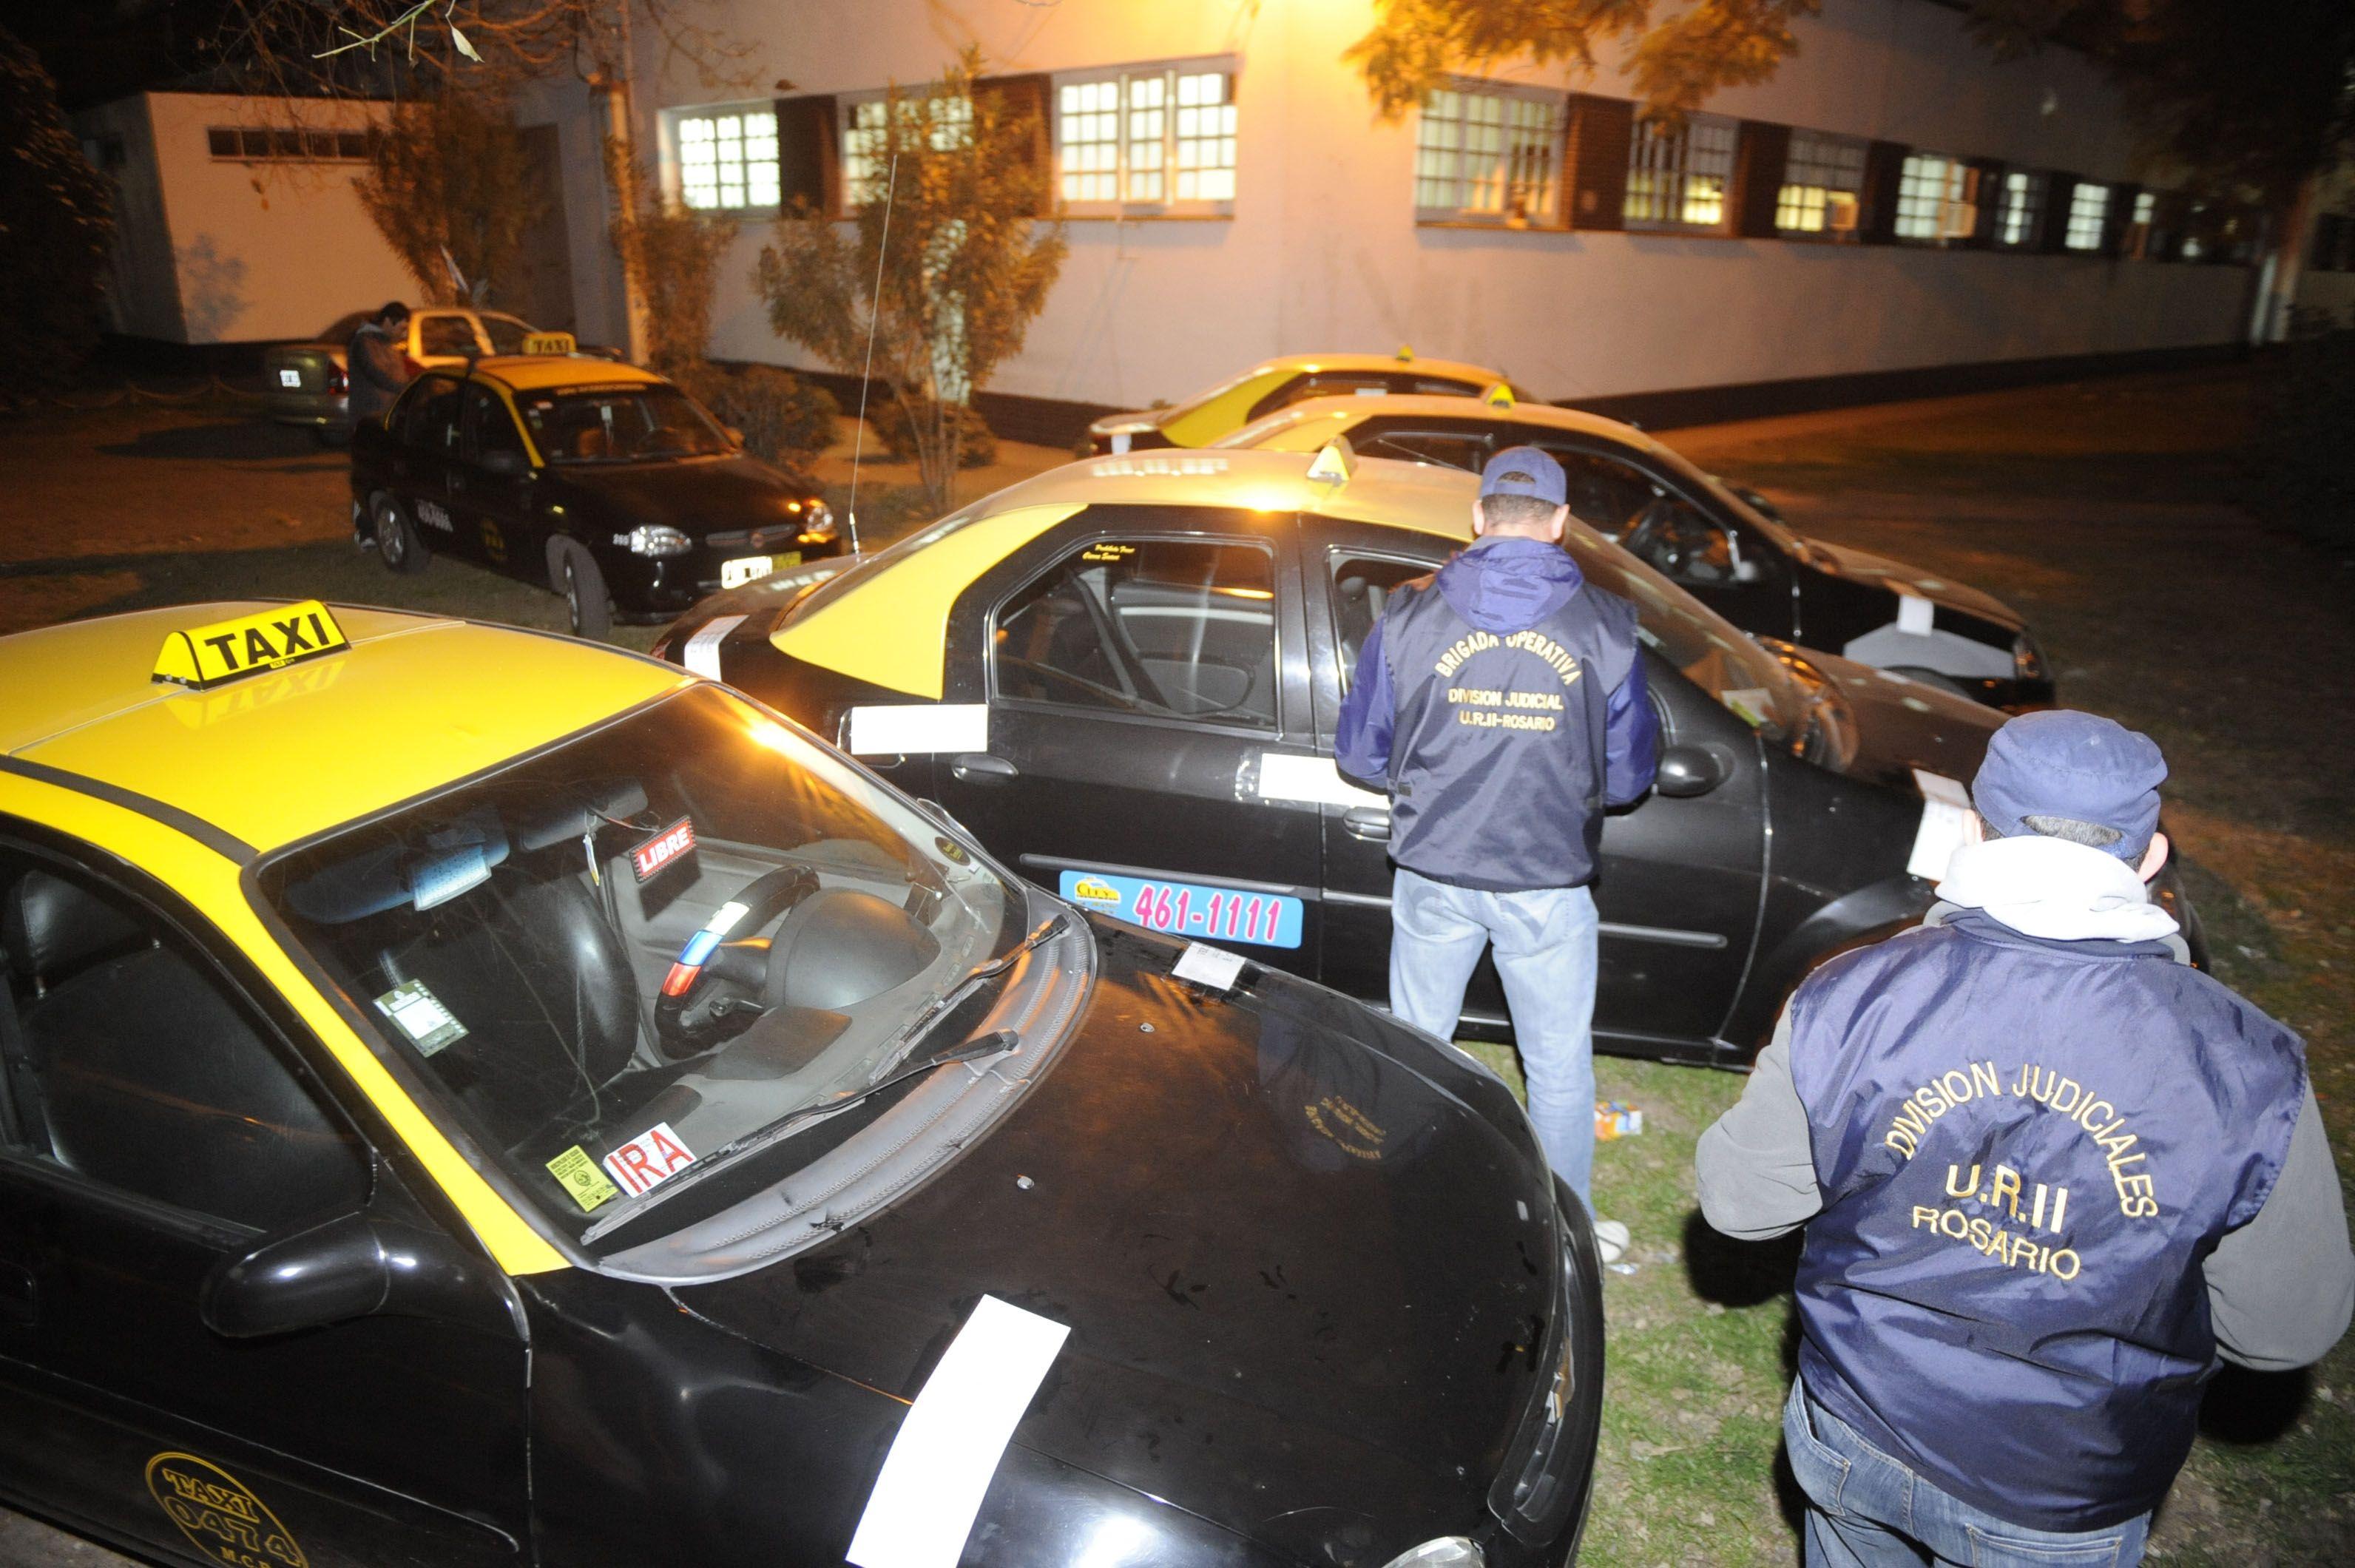 La flota de taxis incautada el jueves